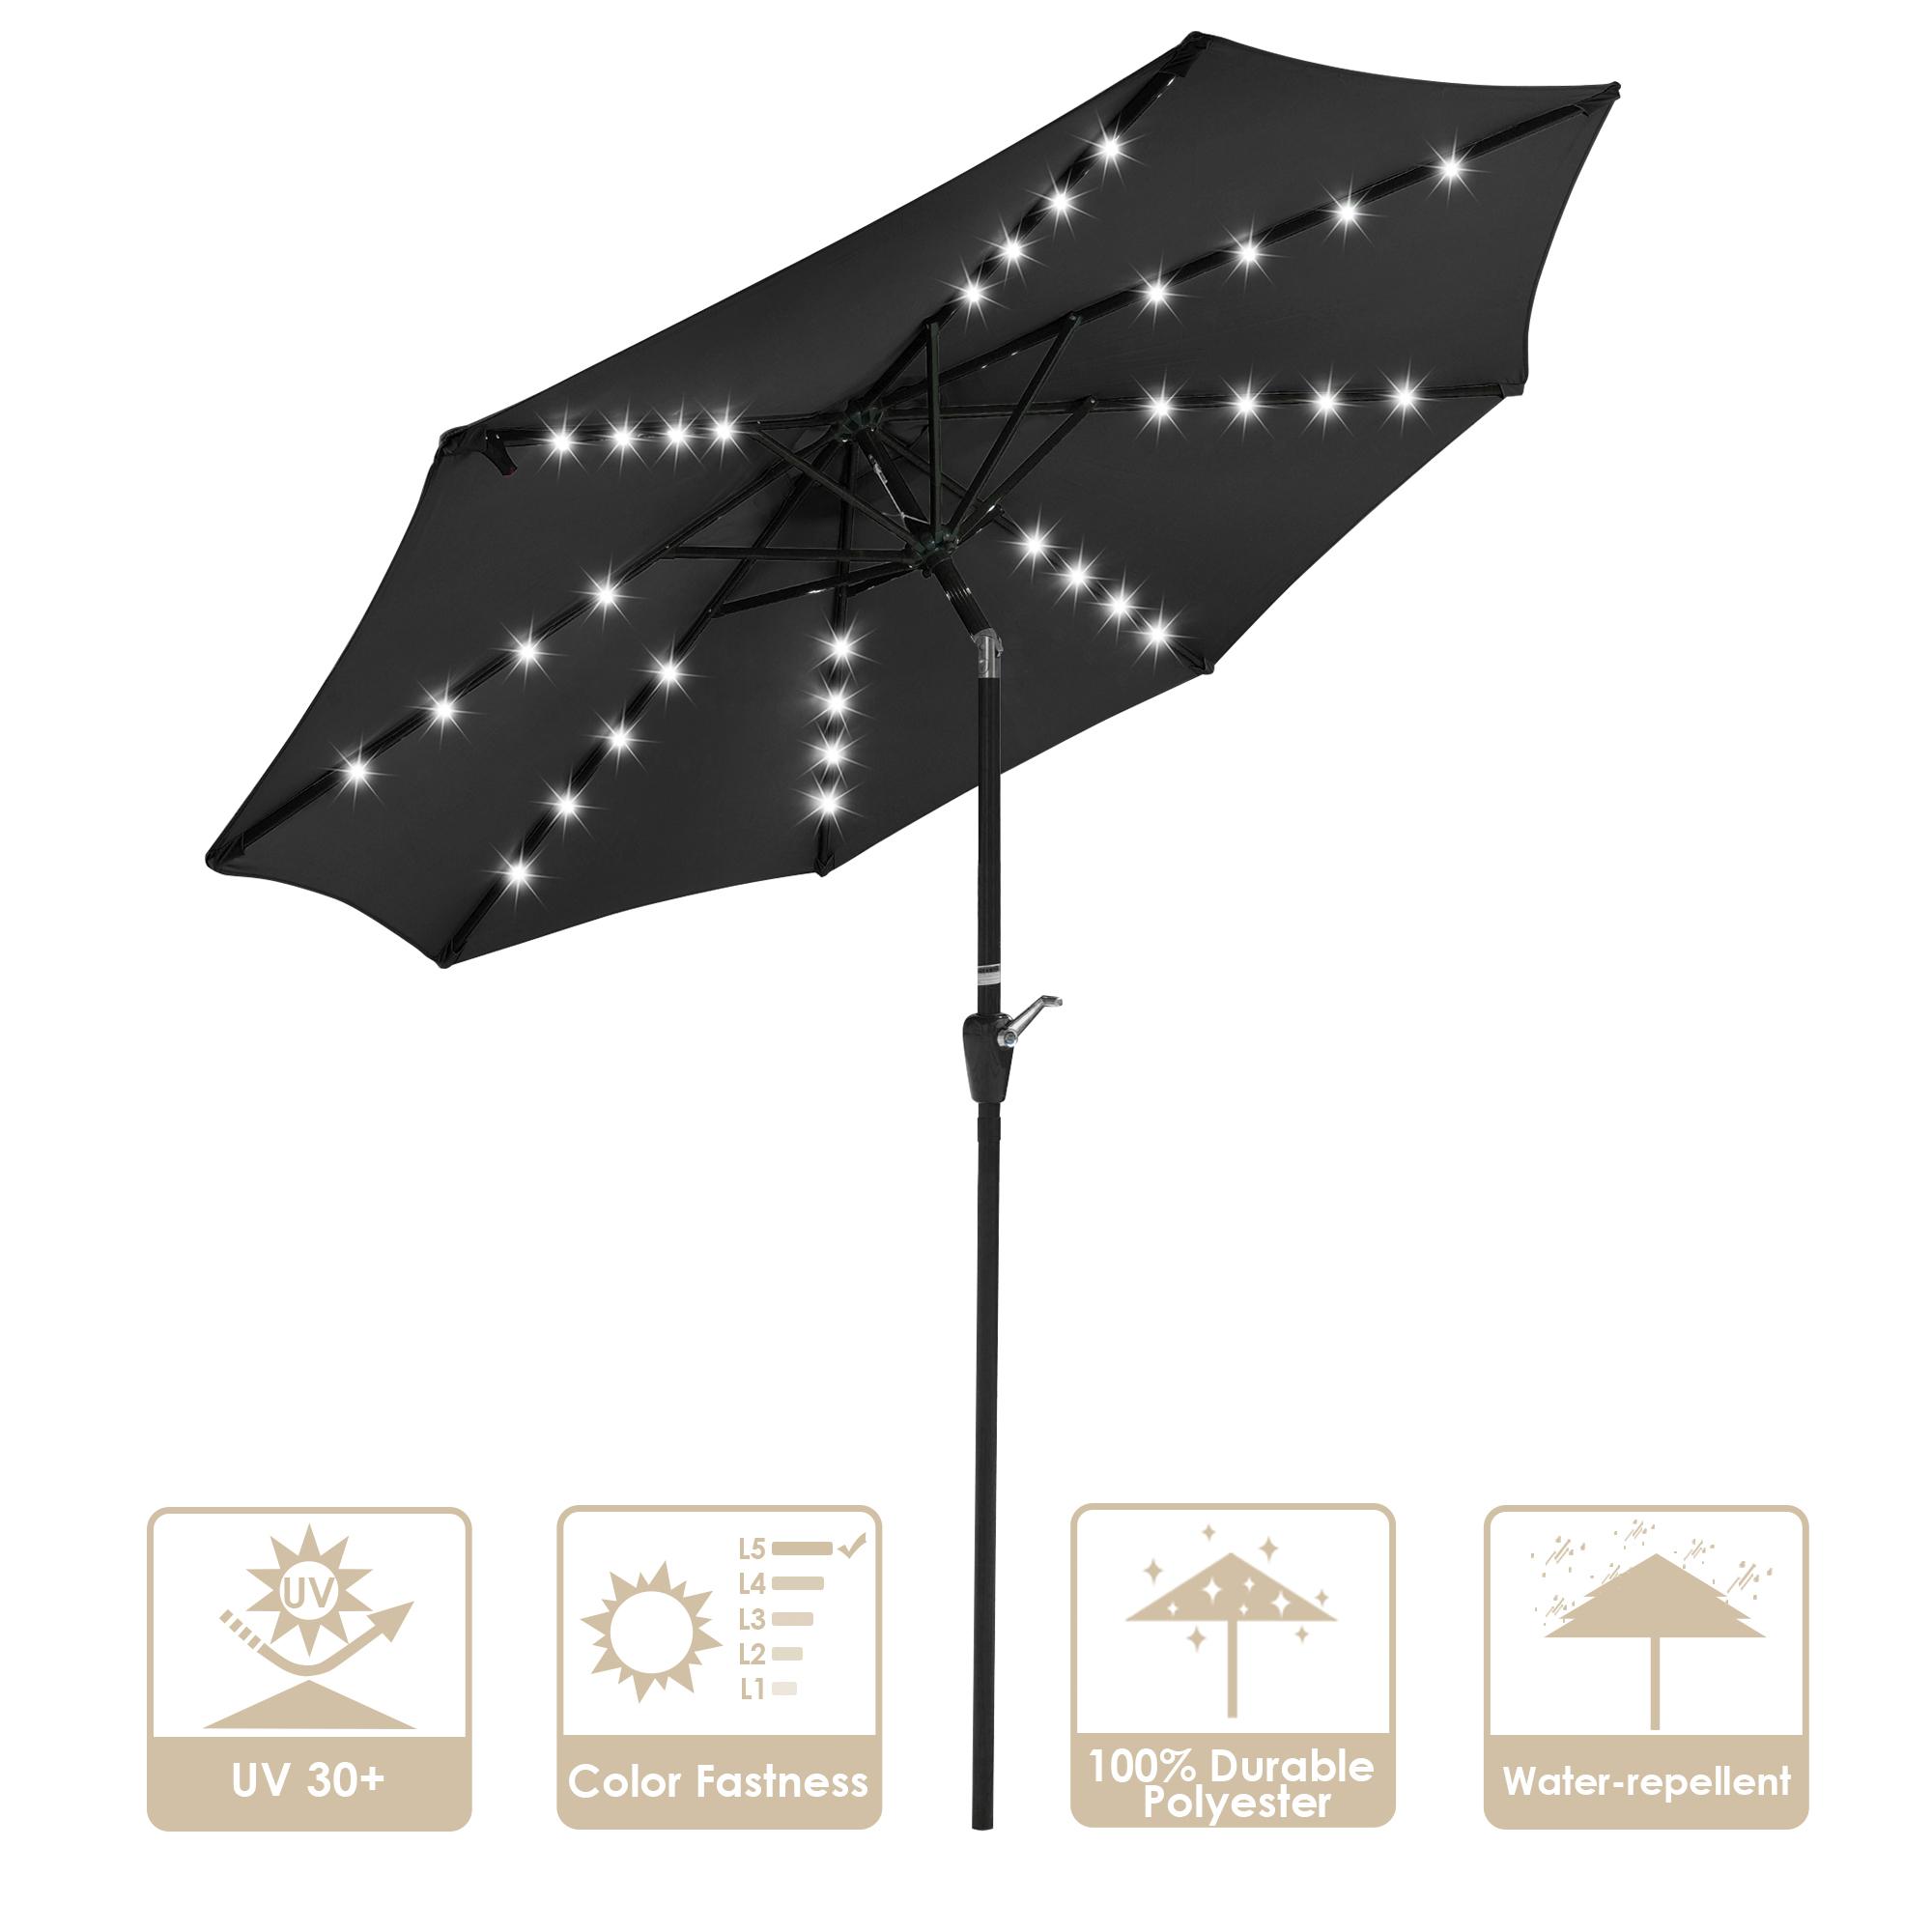 thumbnail 35 - 9' Patio Outdoor Umbrella Solar LED 8 Rib Garden Parasol Yard Deck Table Shade